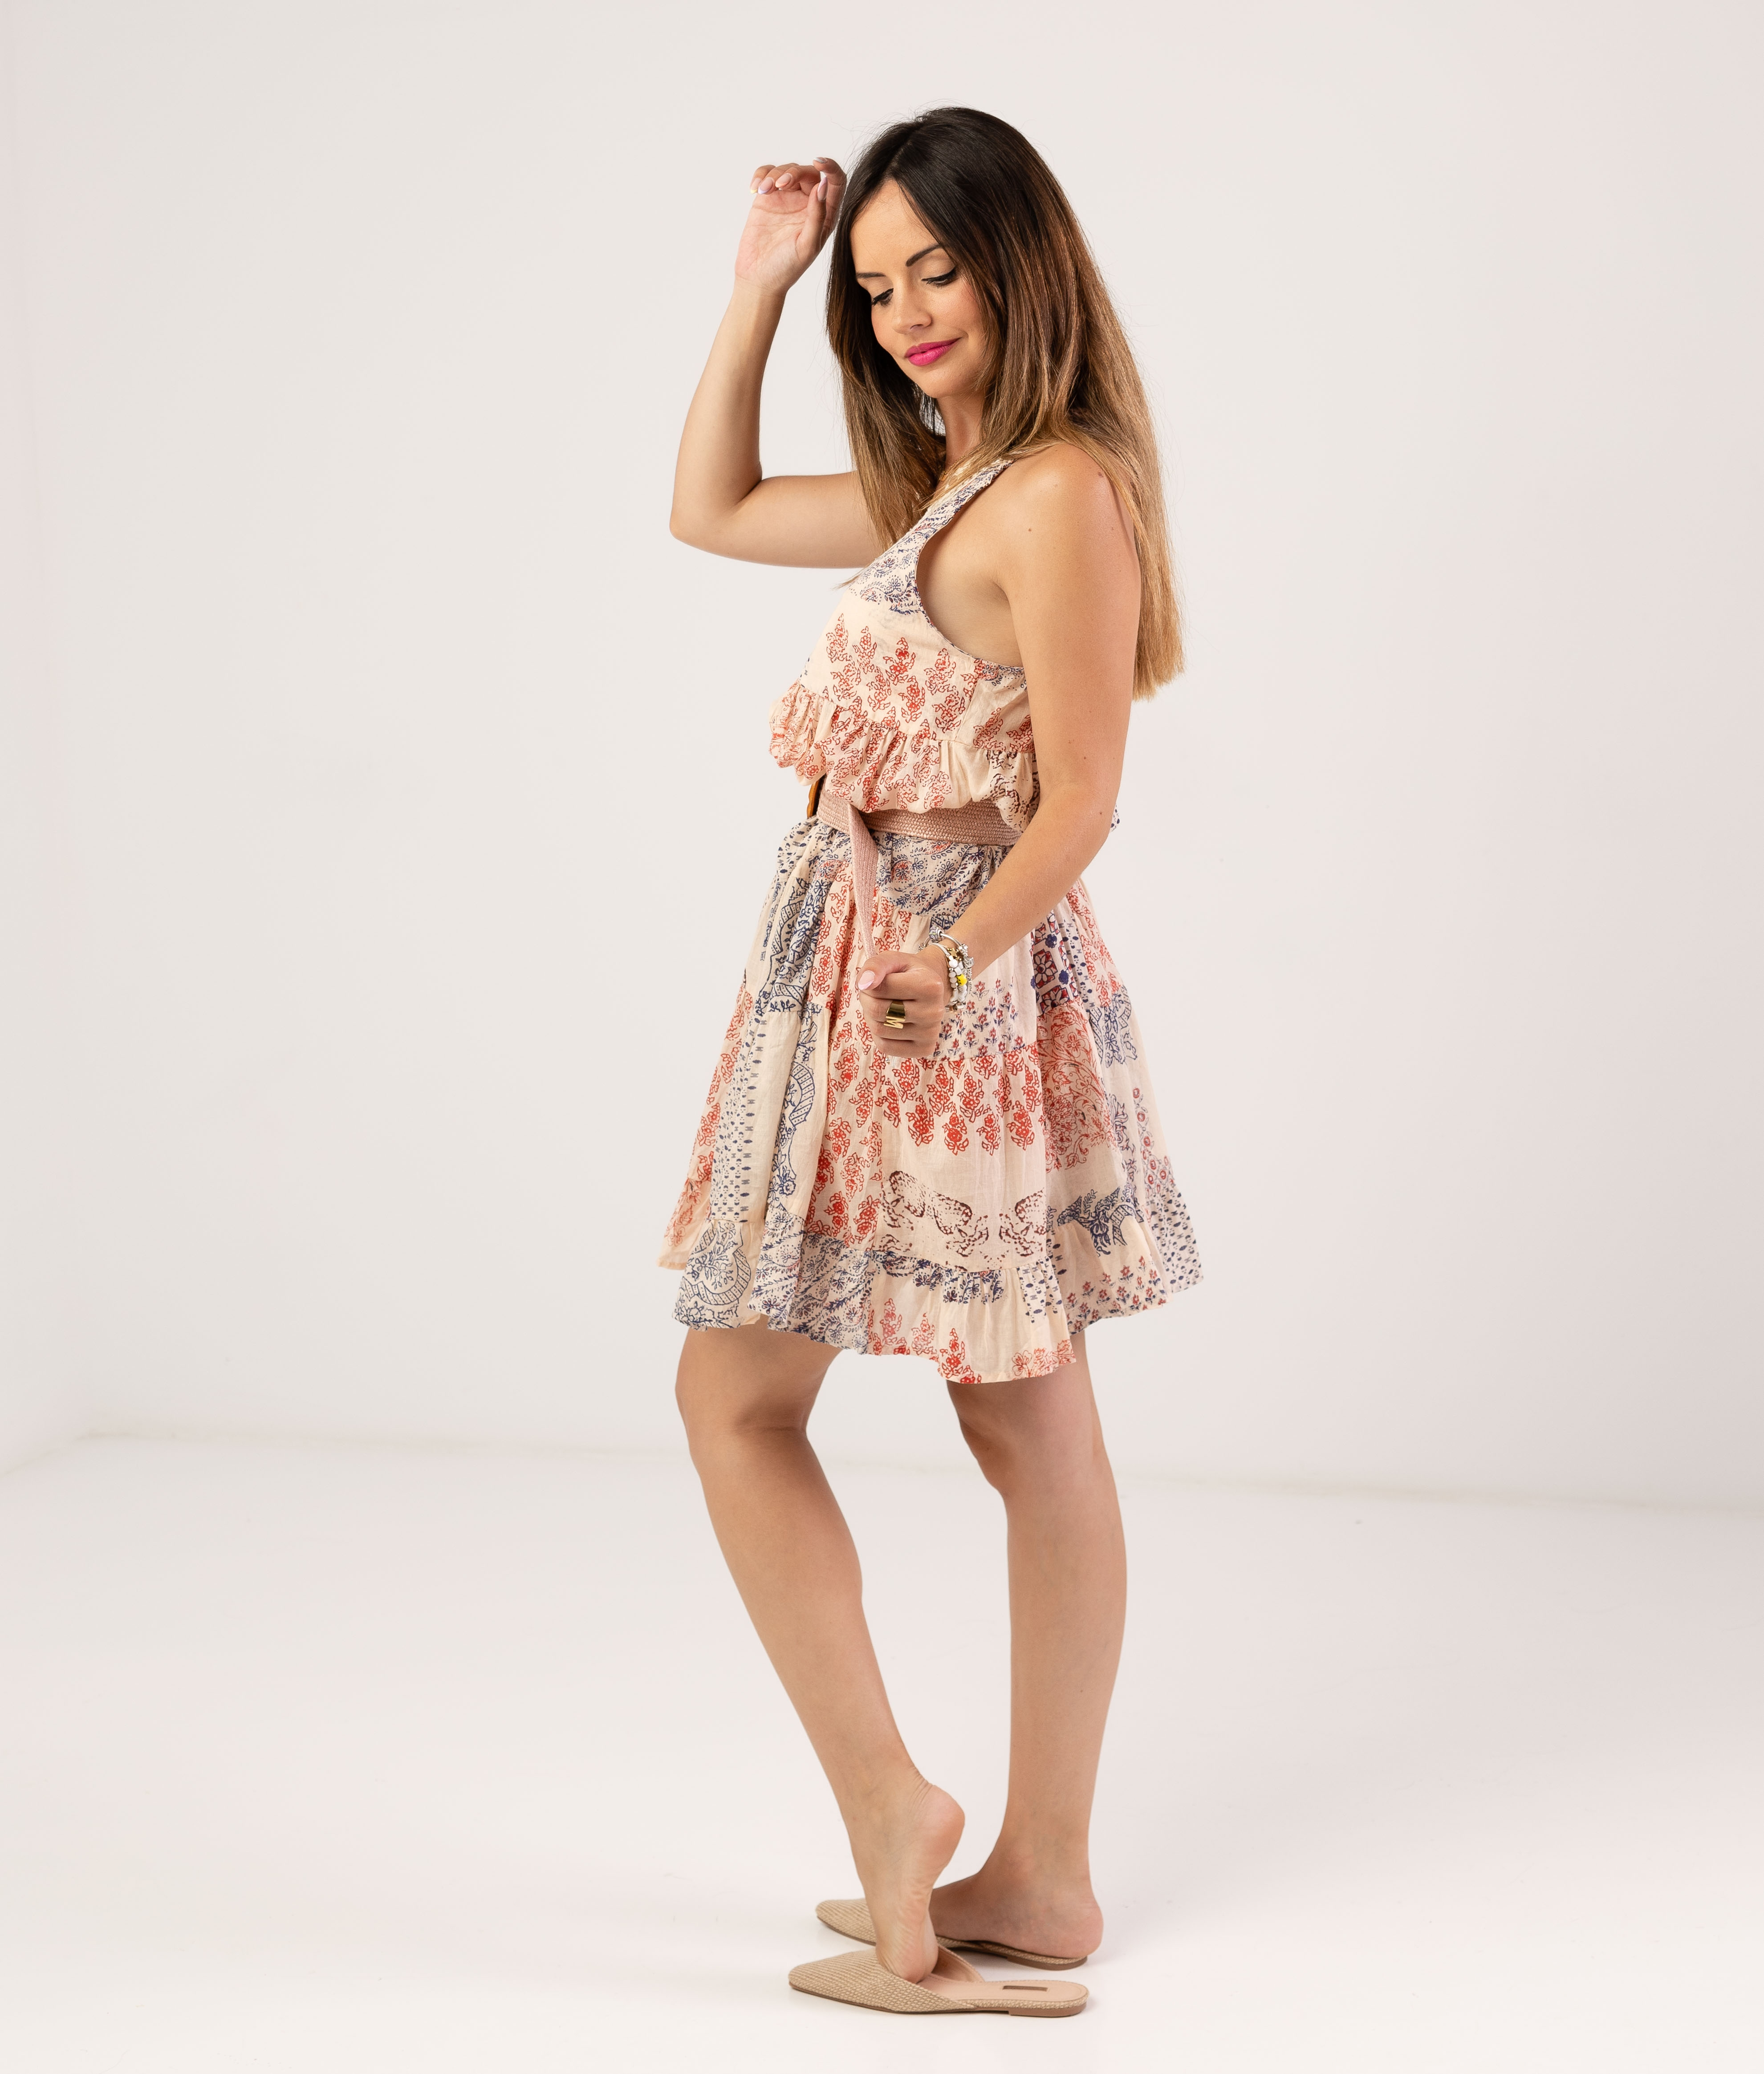 IMALA DRESS - BEIGE